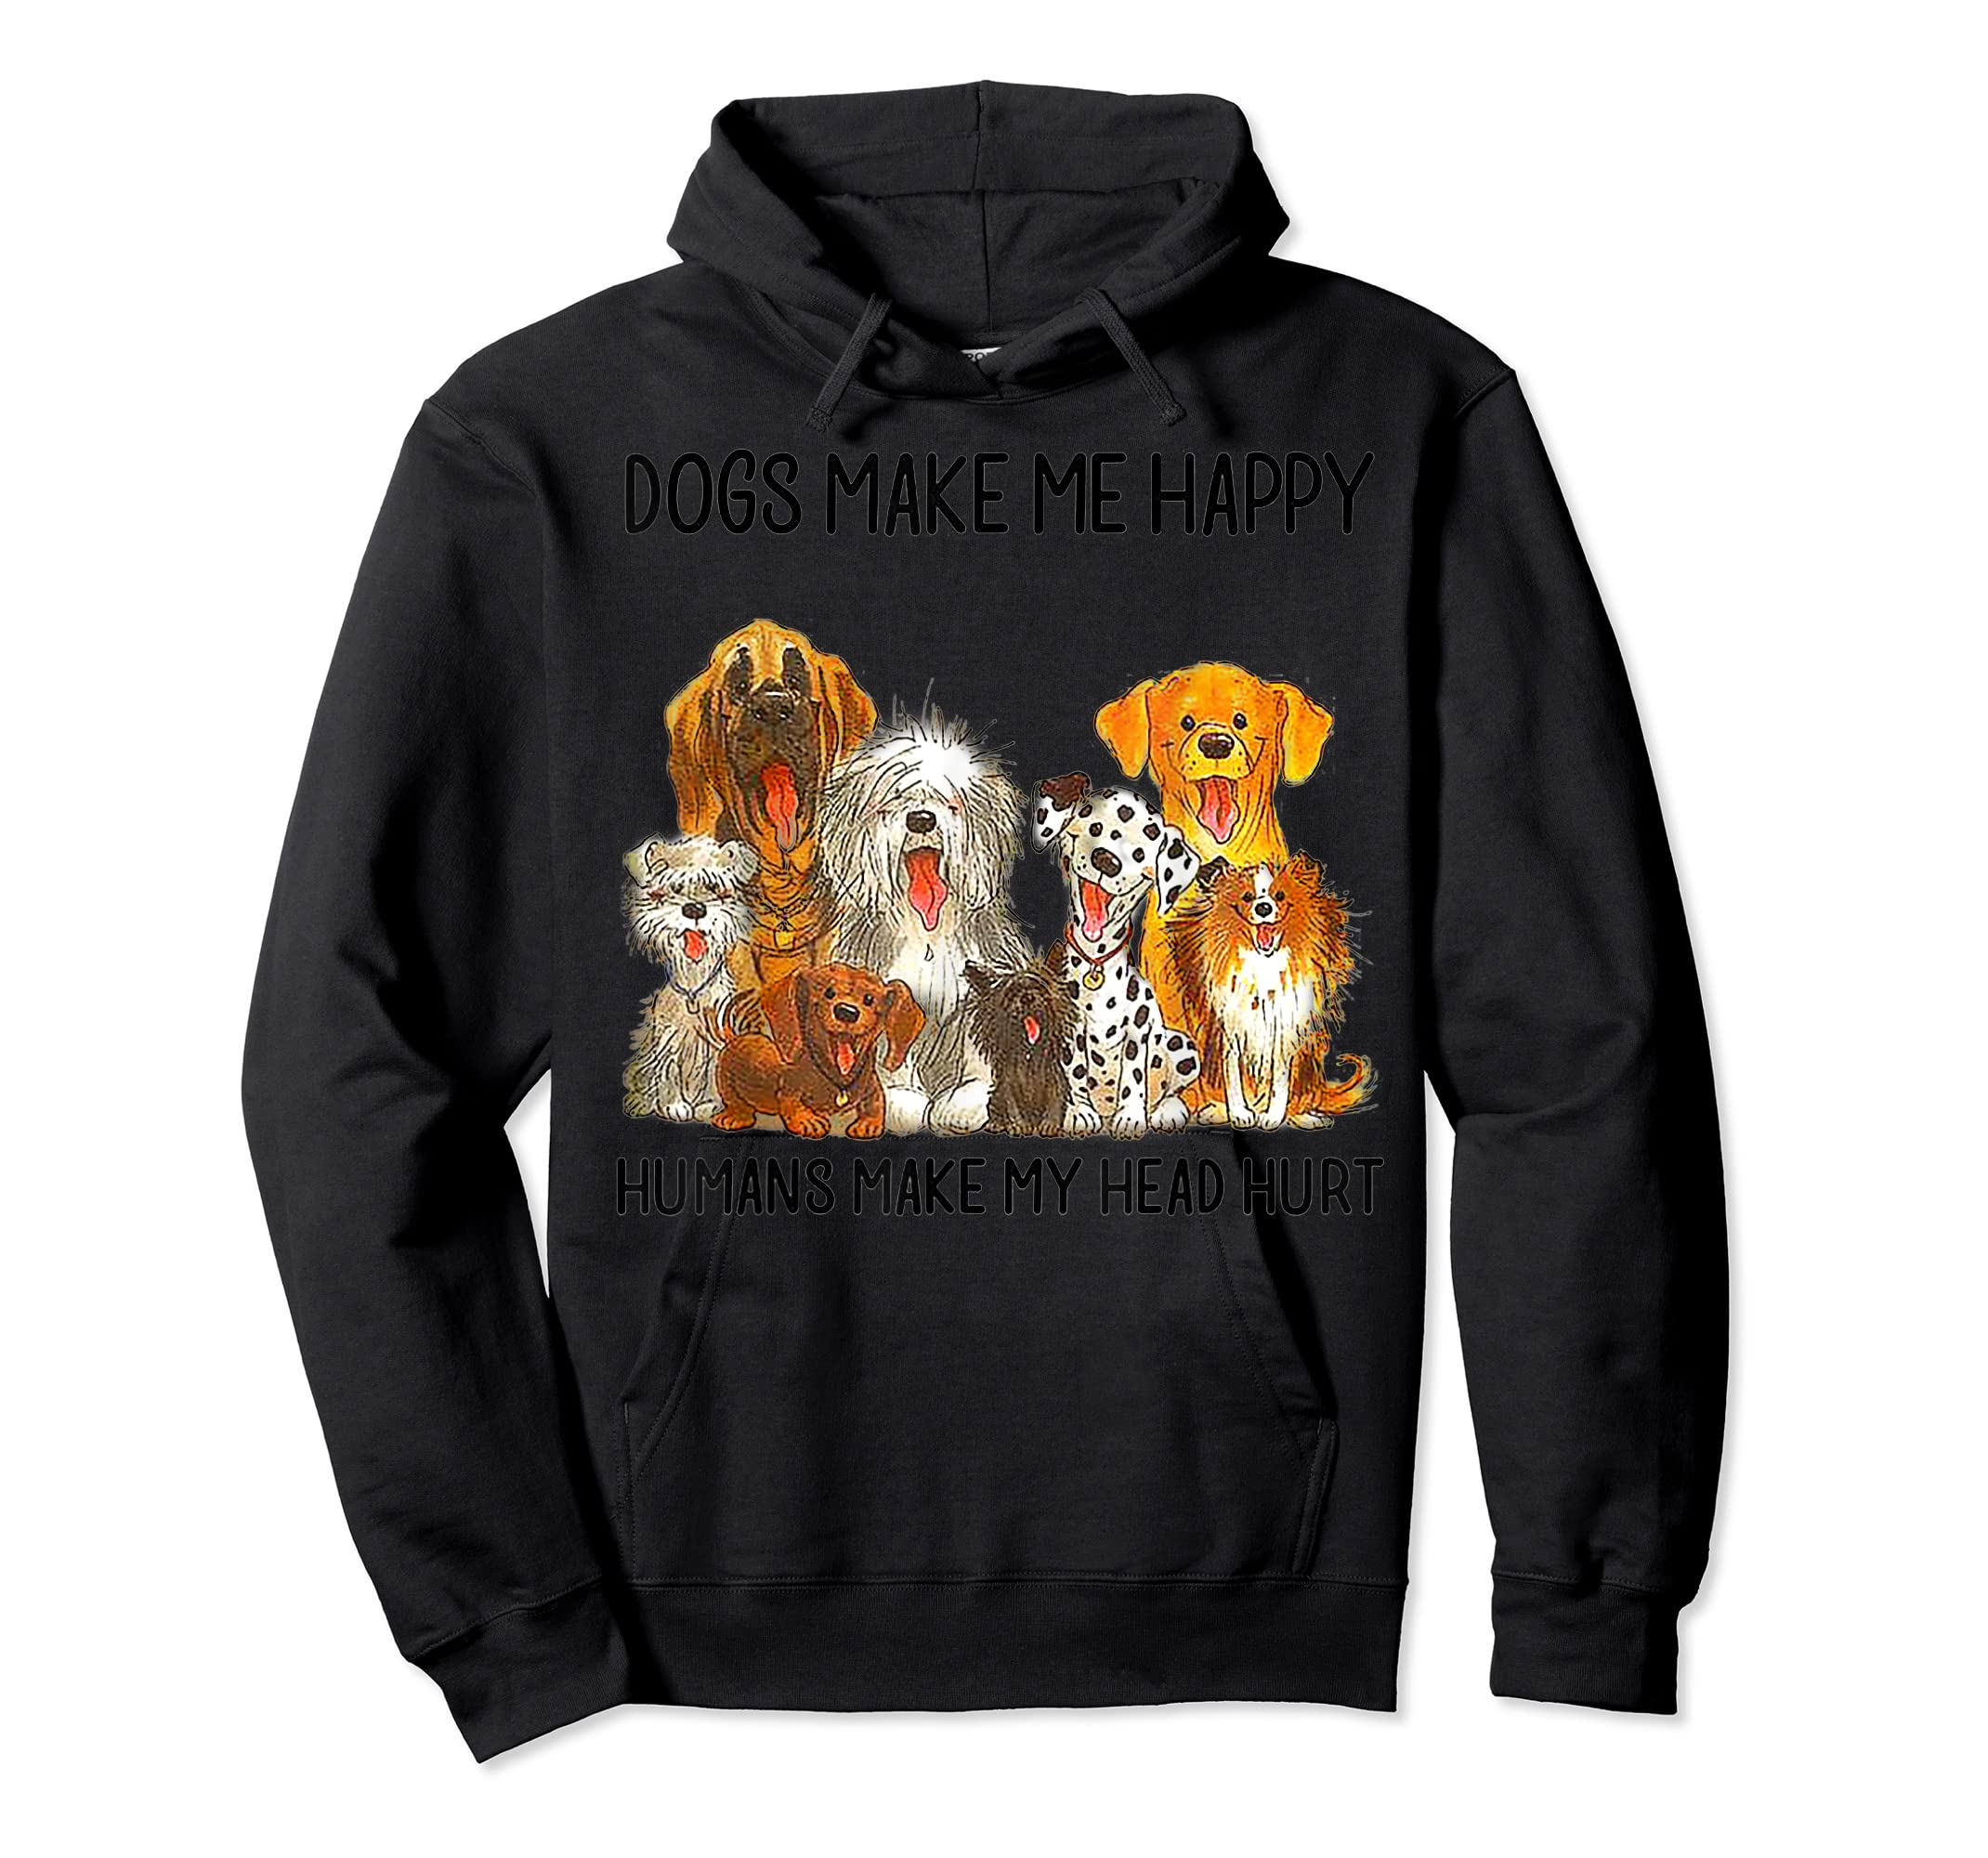 Dogs Make Me Happy Humans Make My Head Hurt Tshirt-Hoodie-Black